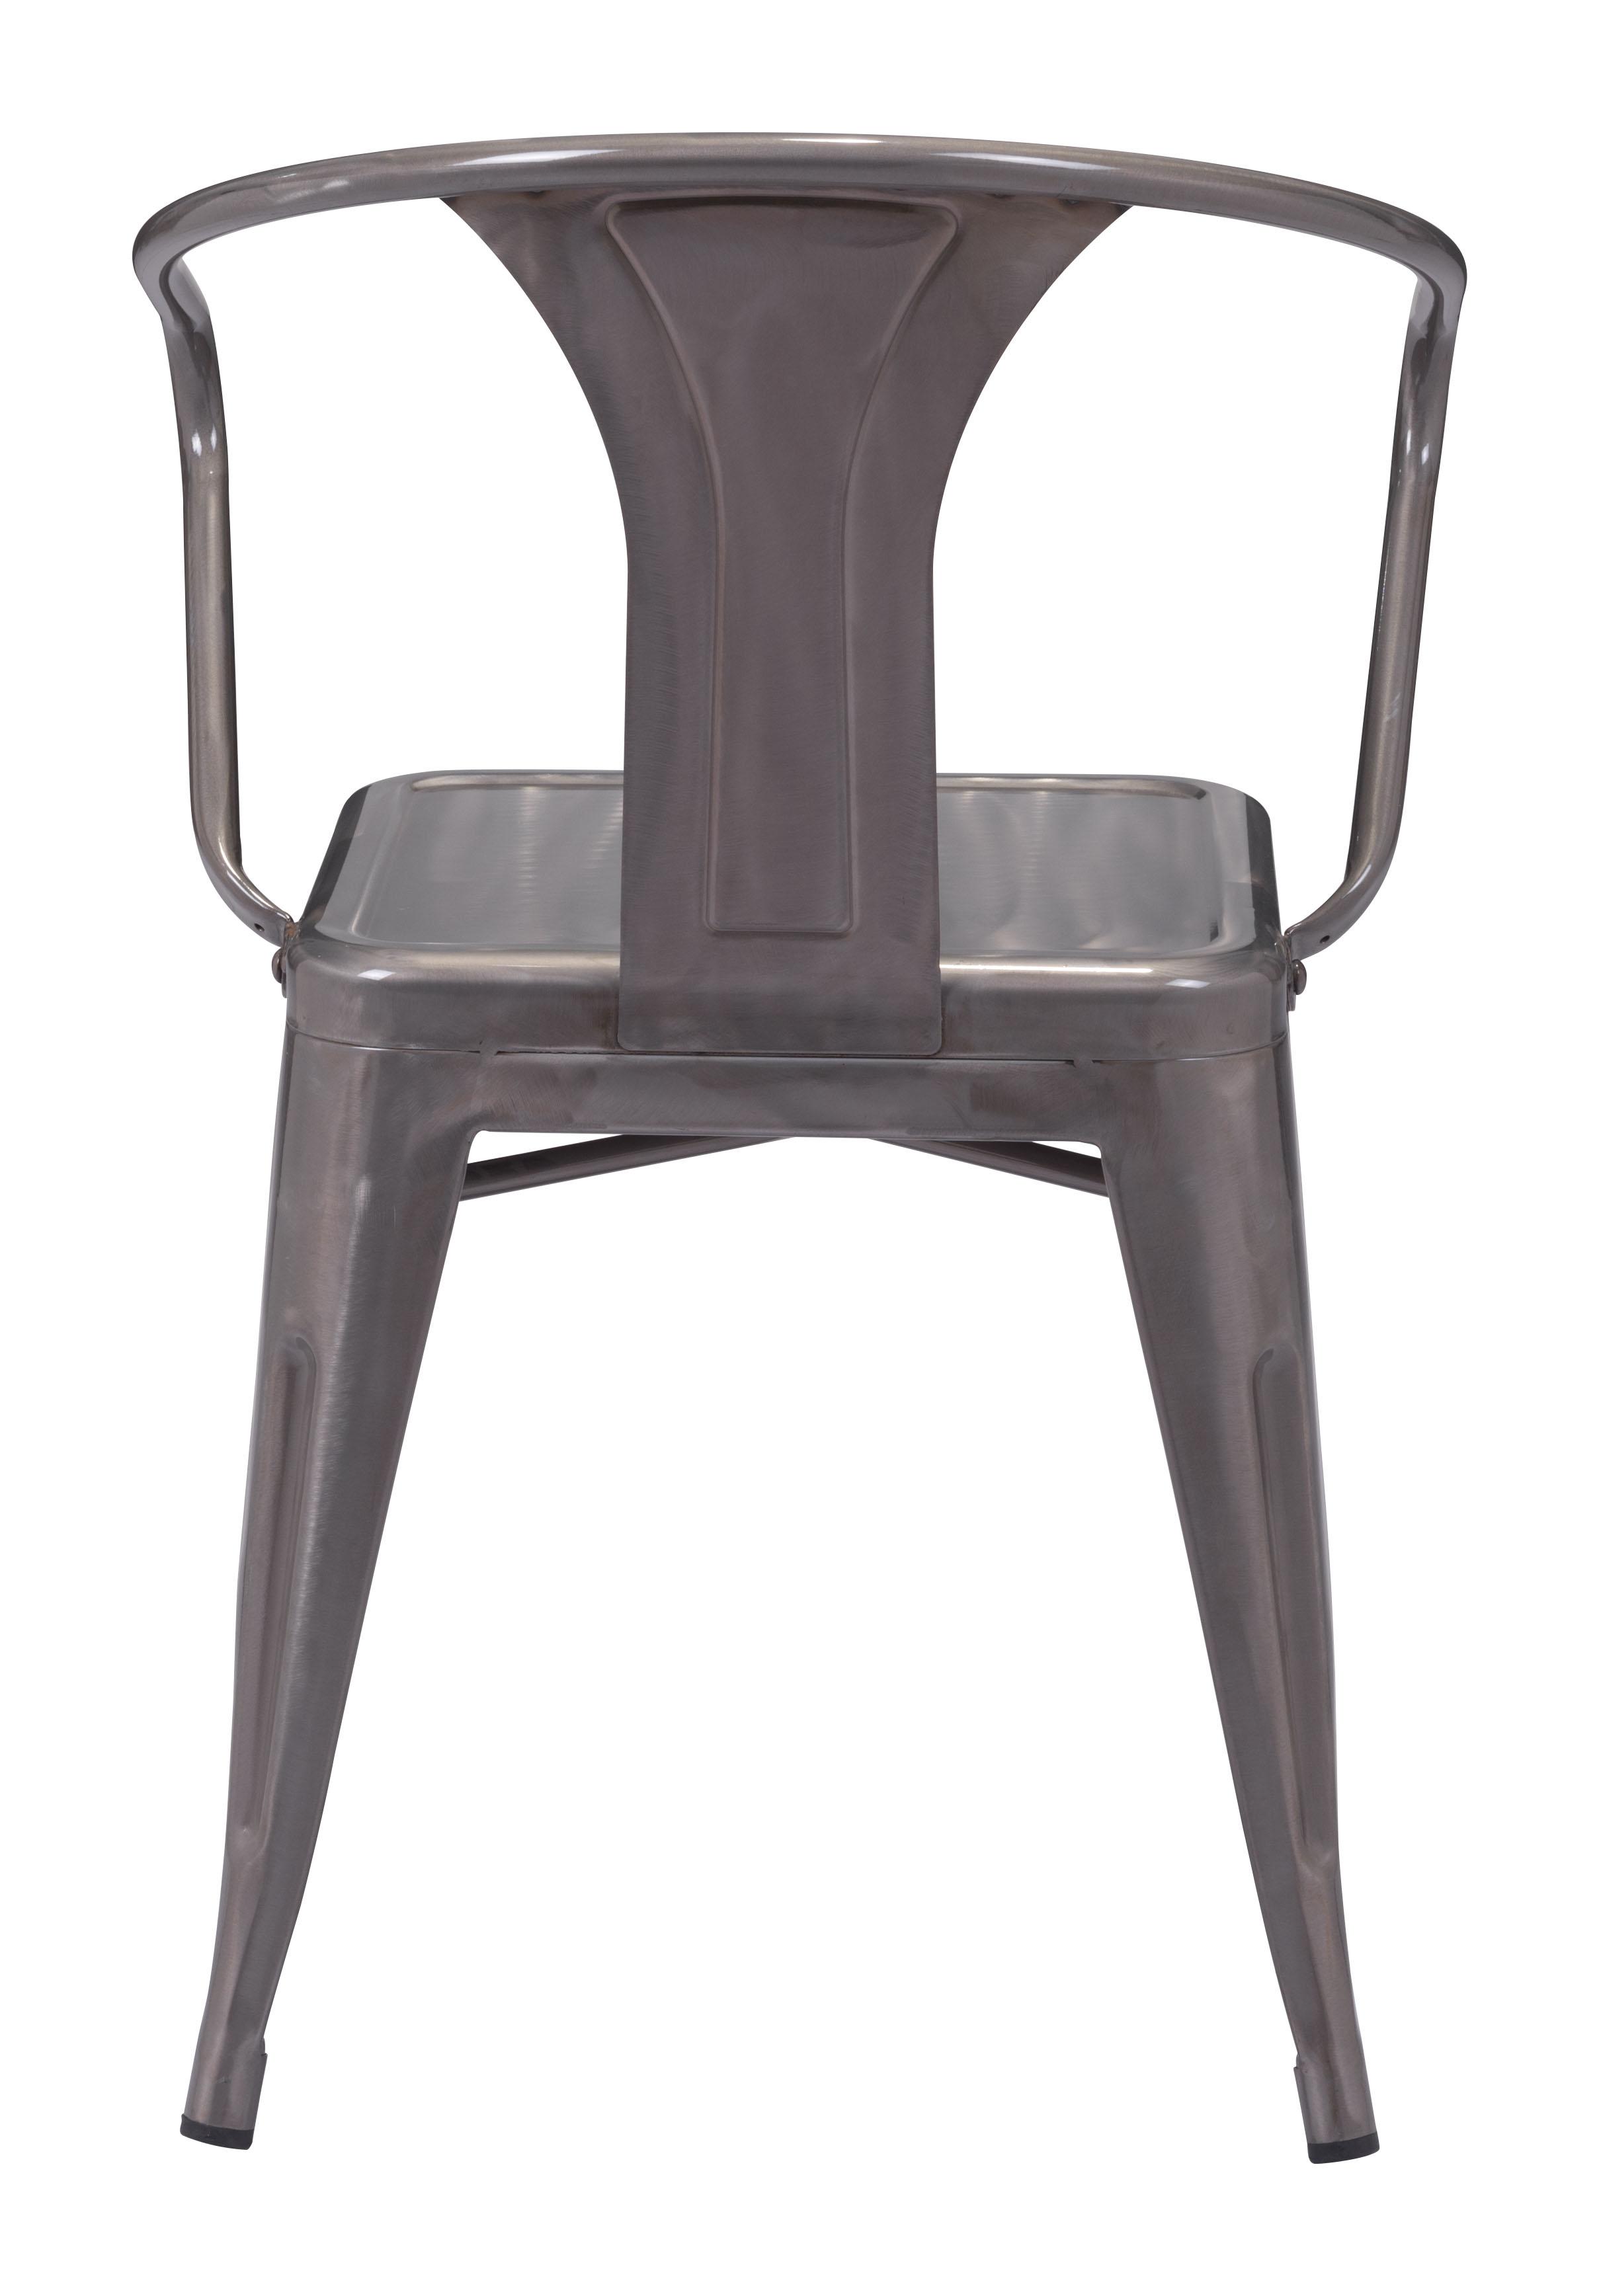 zuo-108145-helix-dining-chair-gunmetal.jpg